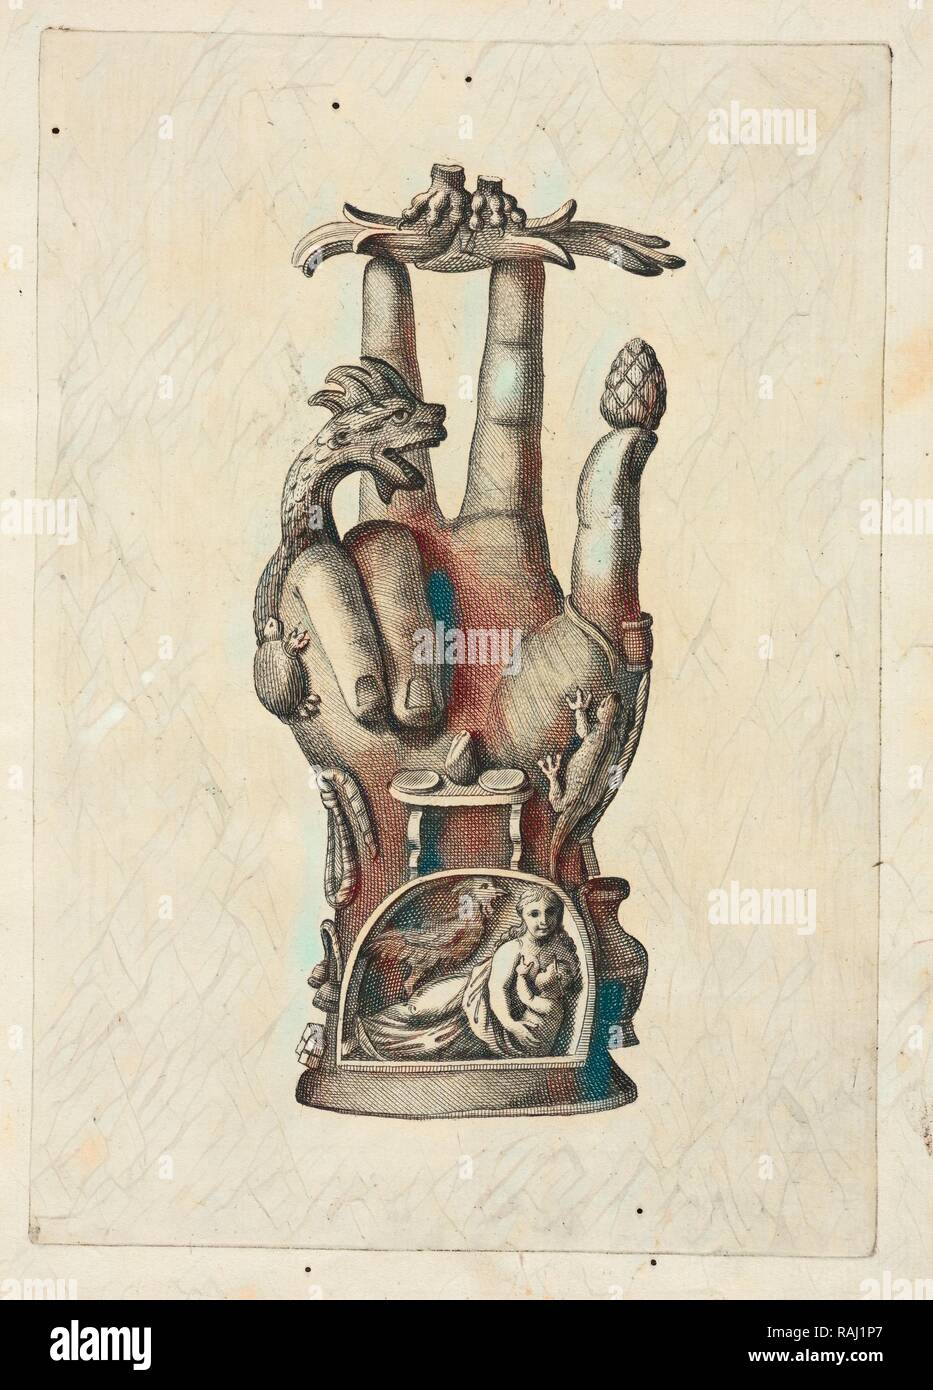 Mano di bronzo, detta Alcuni monumenti Pantea, del Museo Carrafa, Daniele, Francesco, 1740-1812, el grabado, el aguafuerte reinventado Imagen De Stock